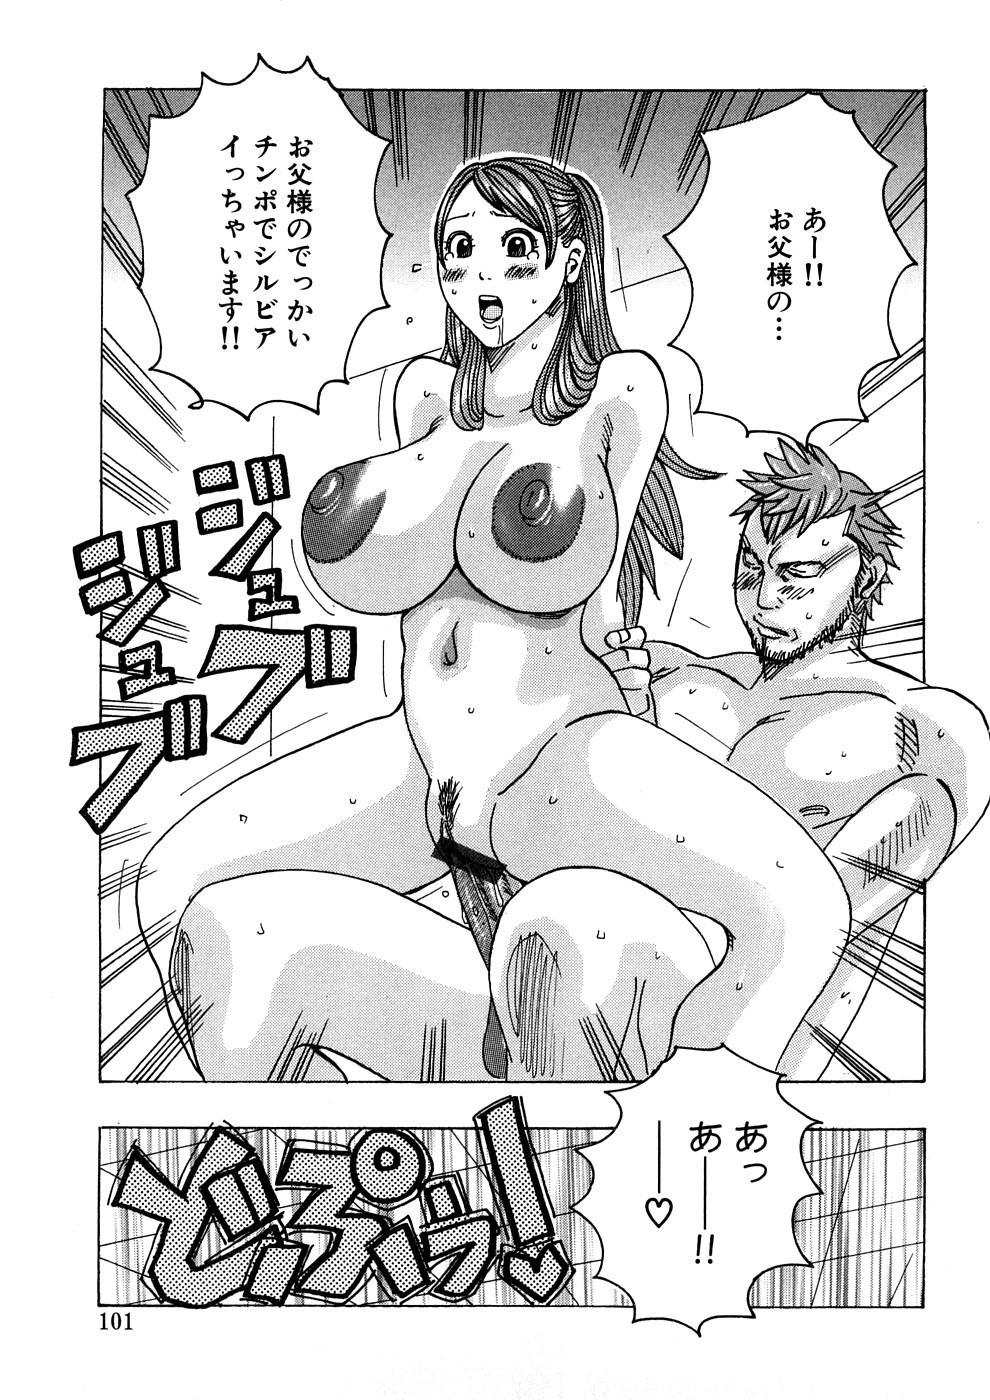 Geki Yaba Anthology Vol. 1 - Naka ni Dashite yo 101